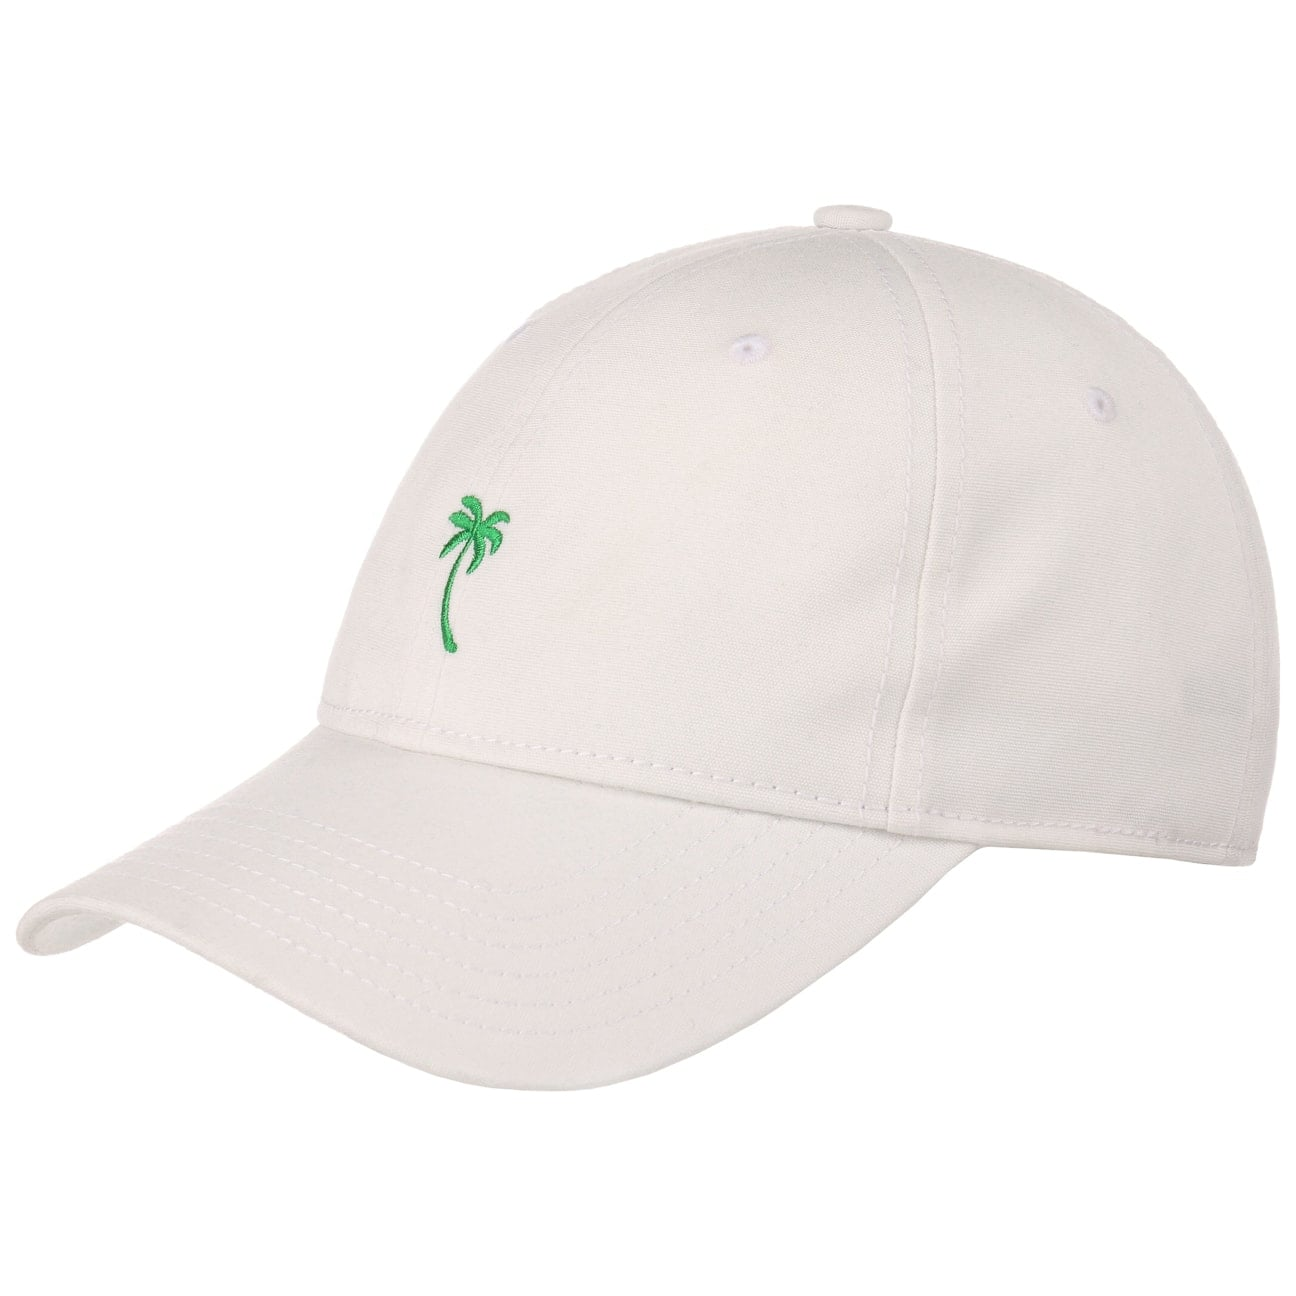 Gorra Palm Curved Brim by dedicated  base cap